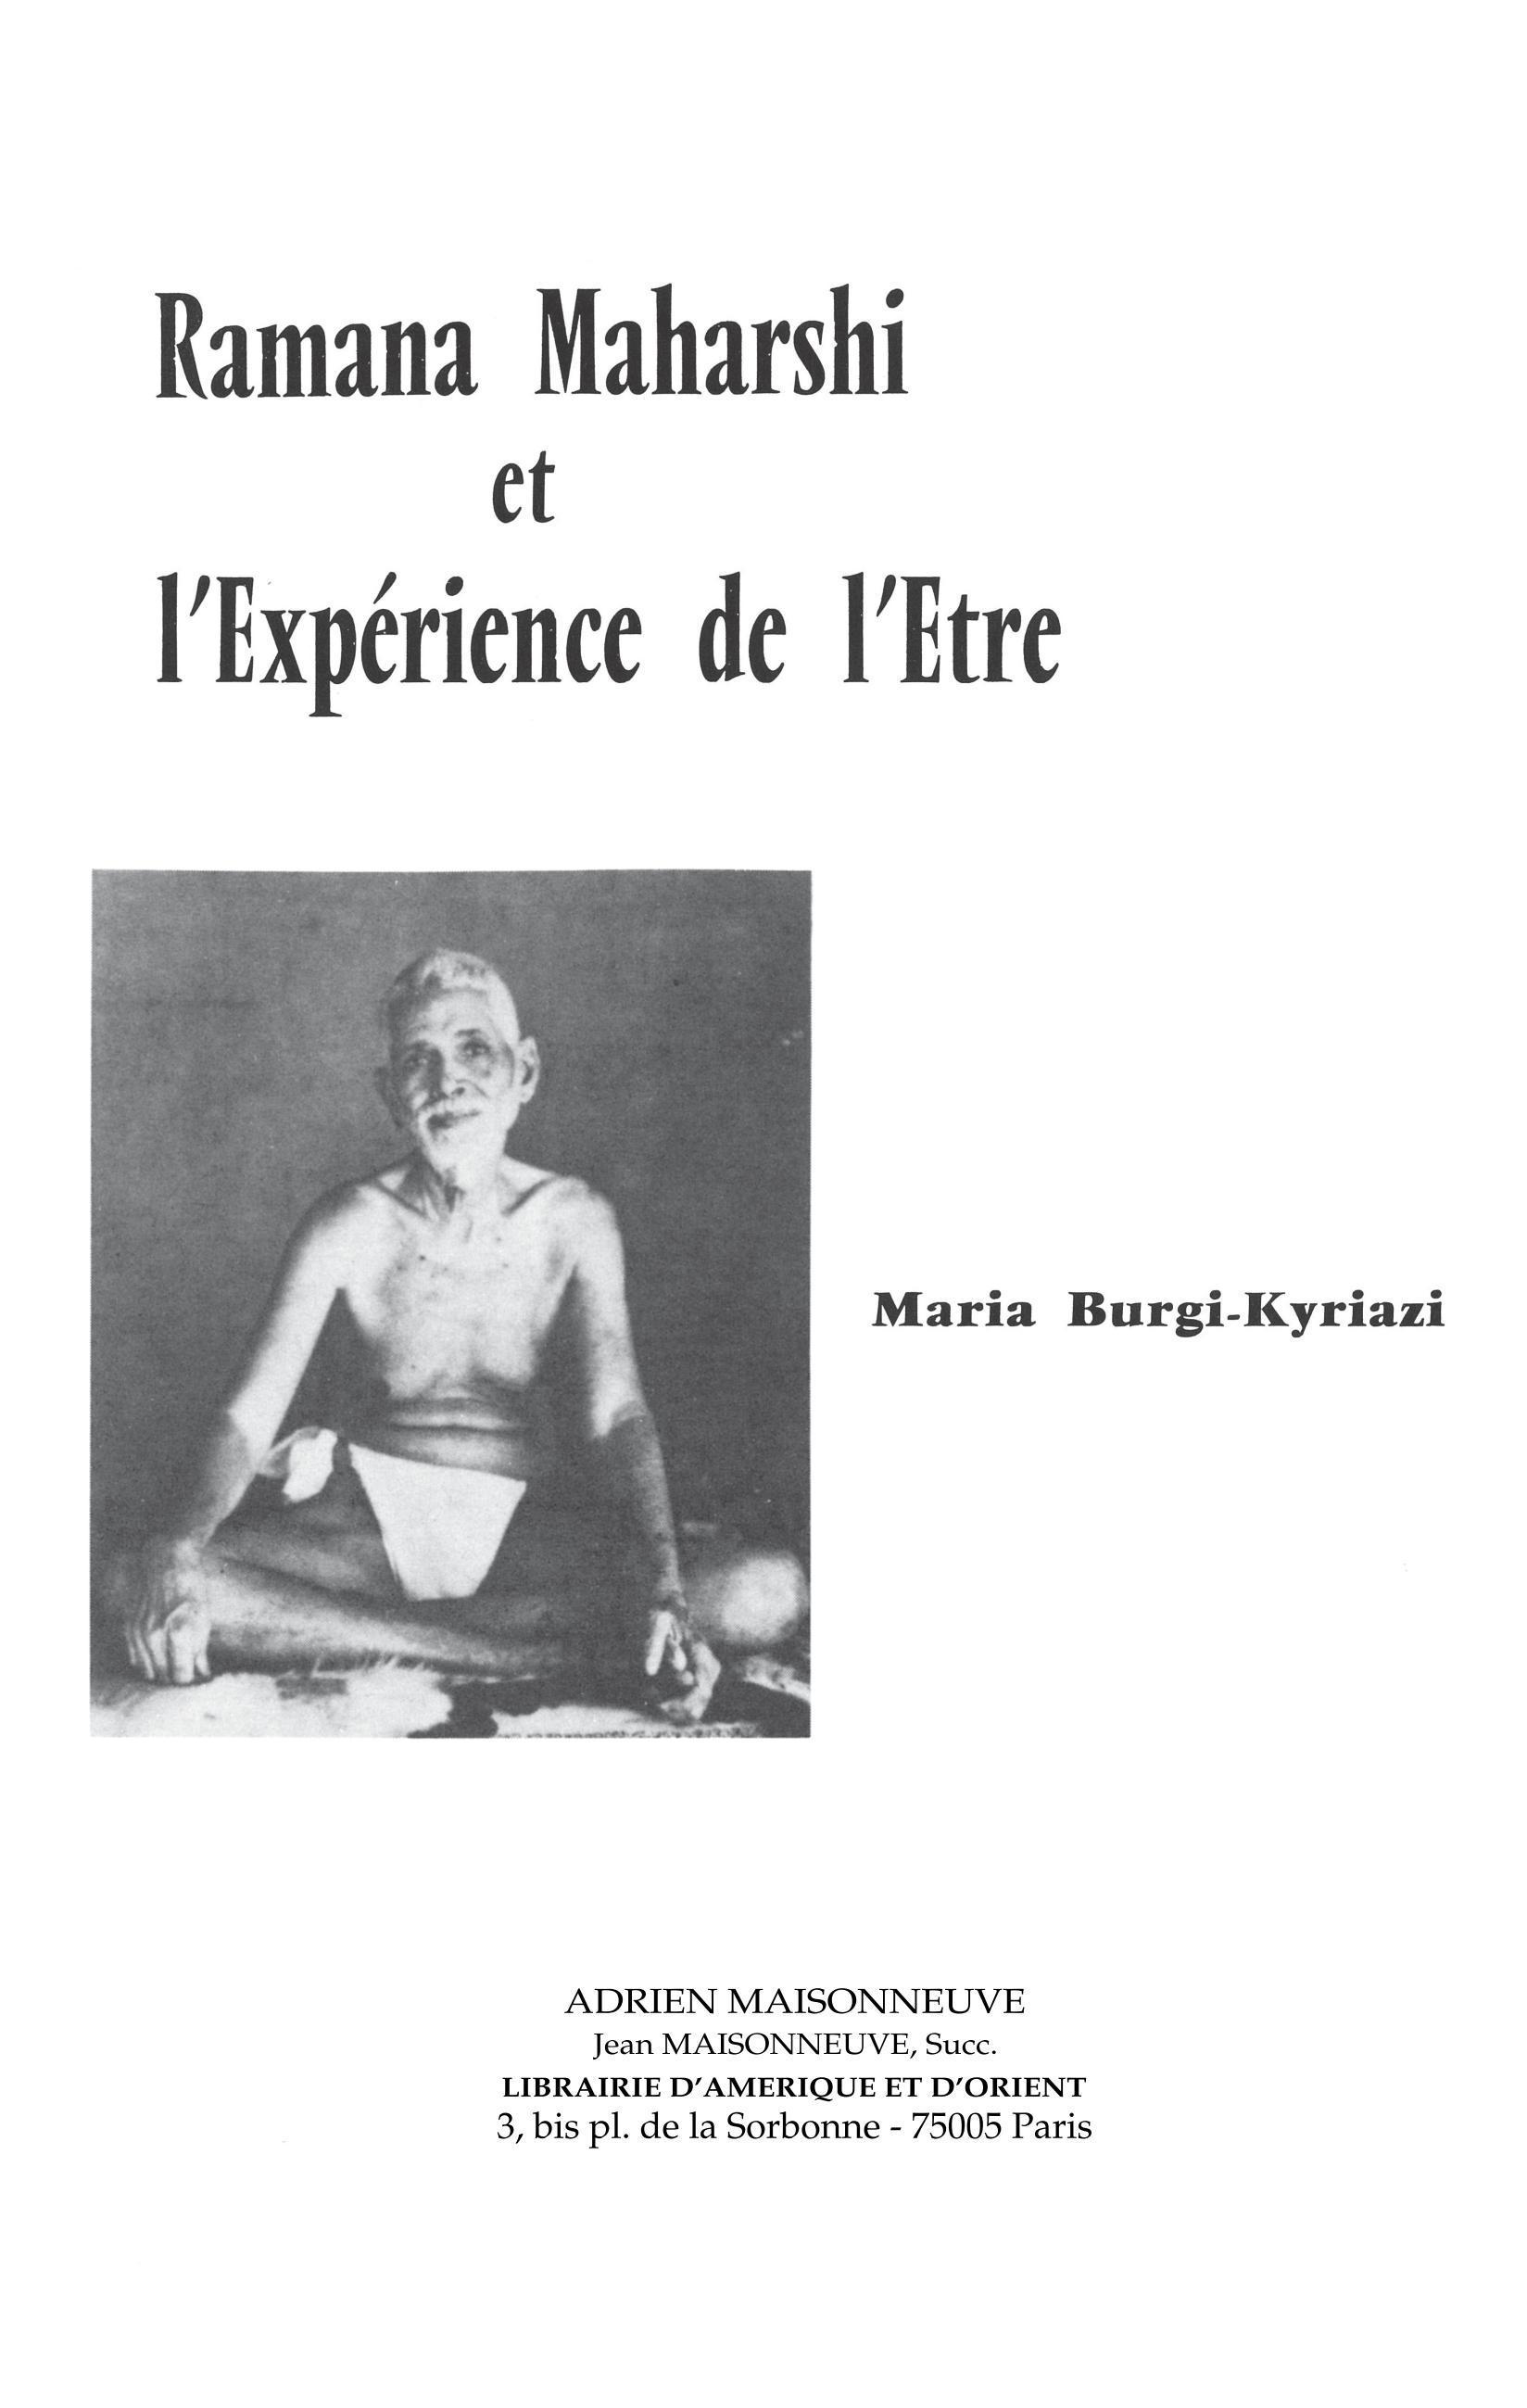 RAMANA MAHARSHI ET L'EXPERIENCE DE L'ETRE